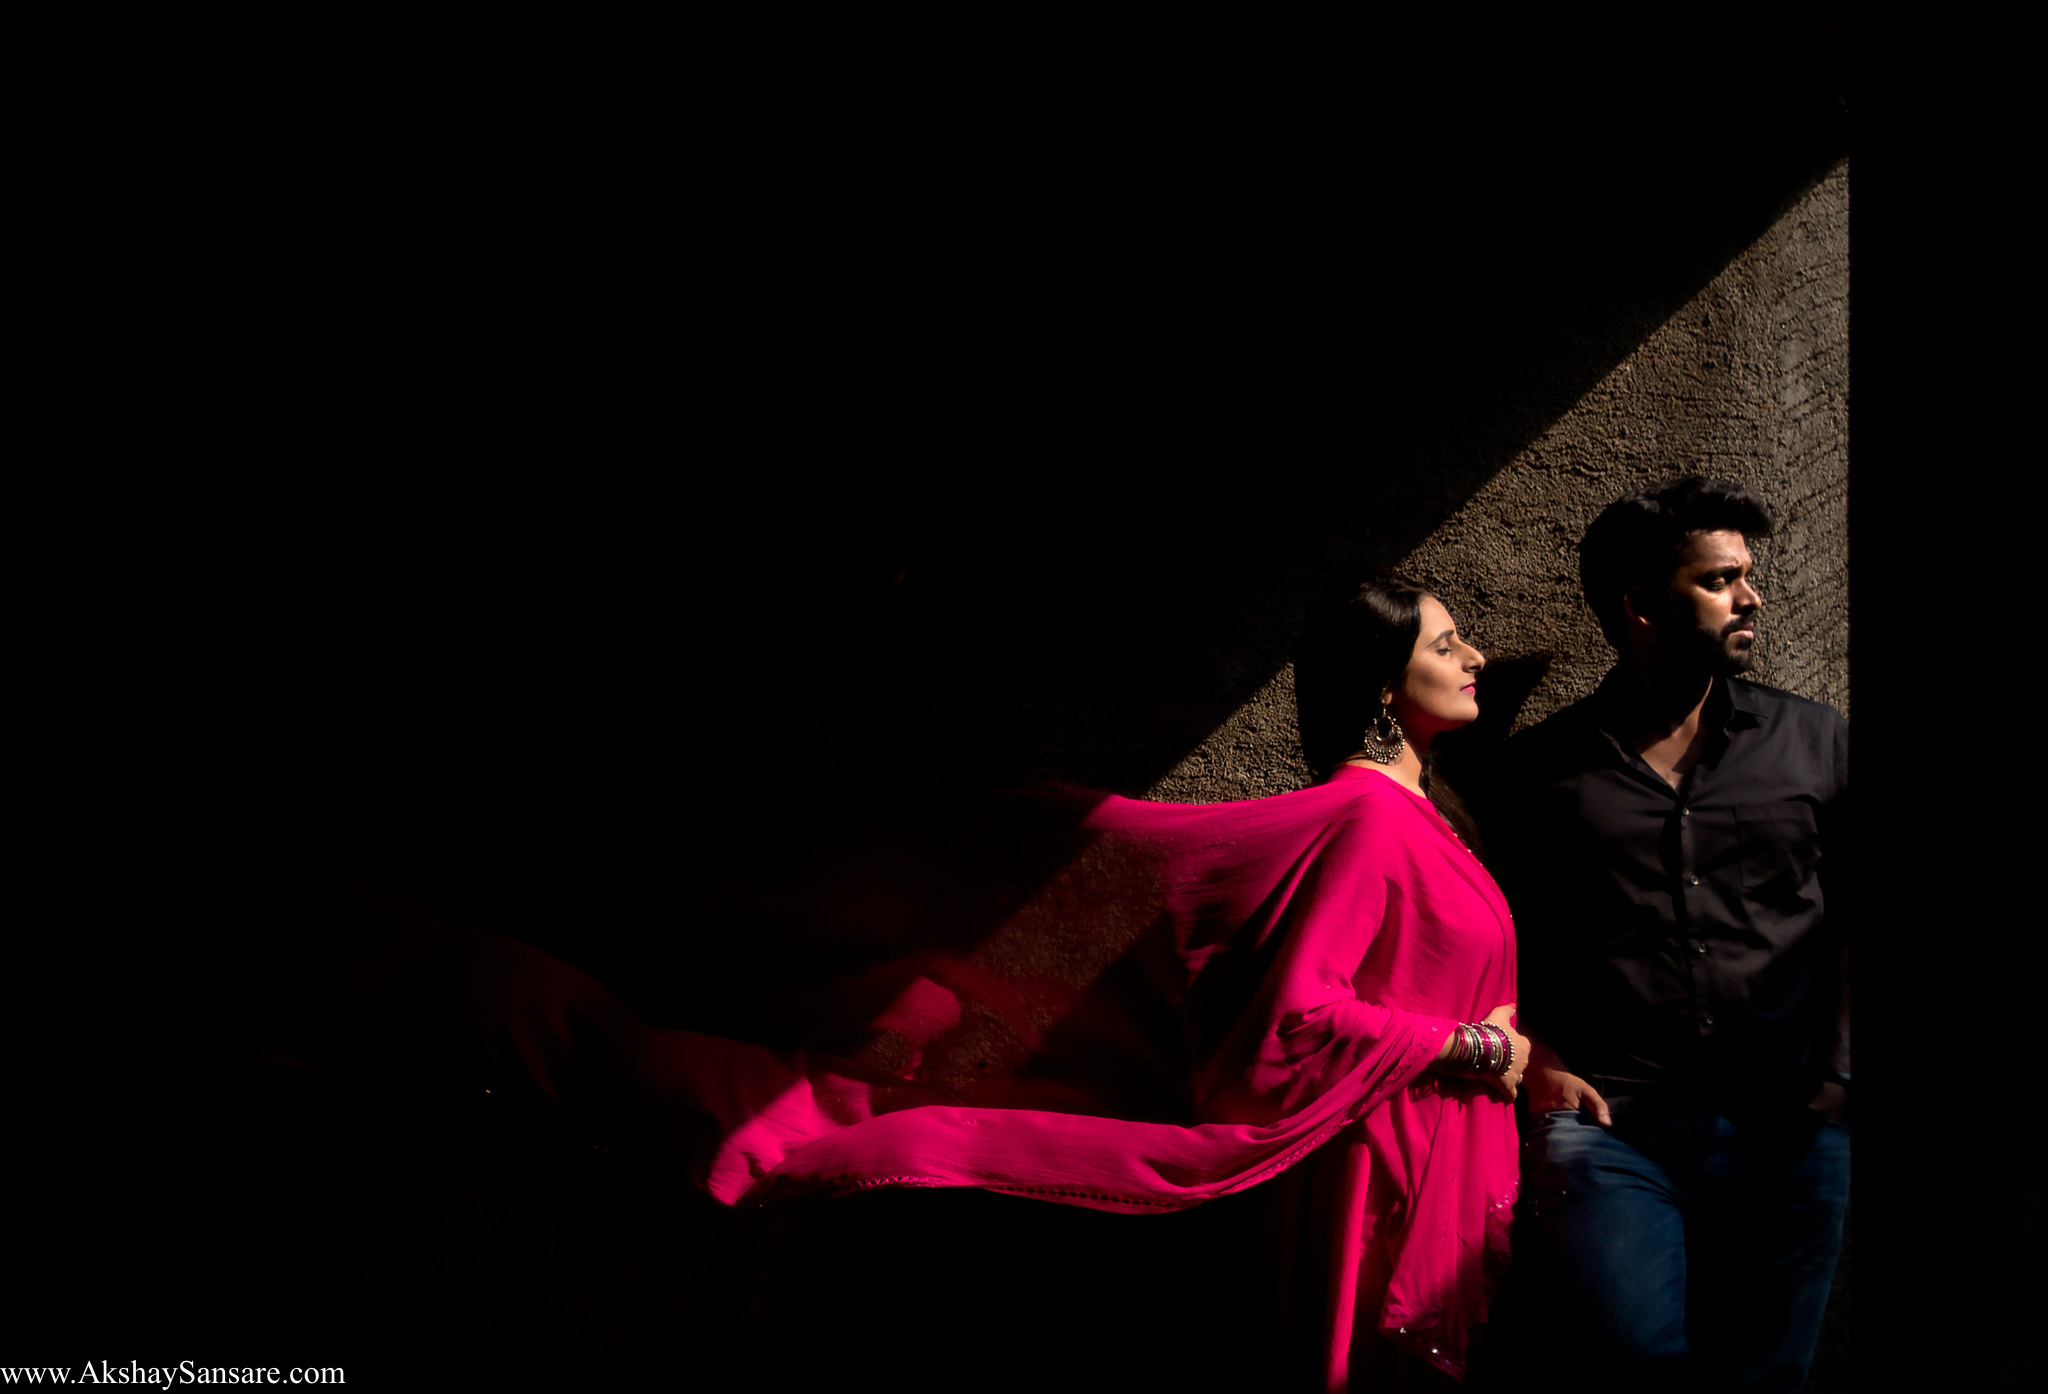 Priyanka x Sushank Pre-wedding Best Candid Photographer in Mumbai Akshay Sansare India(3).jpg